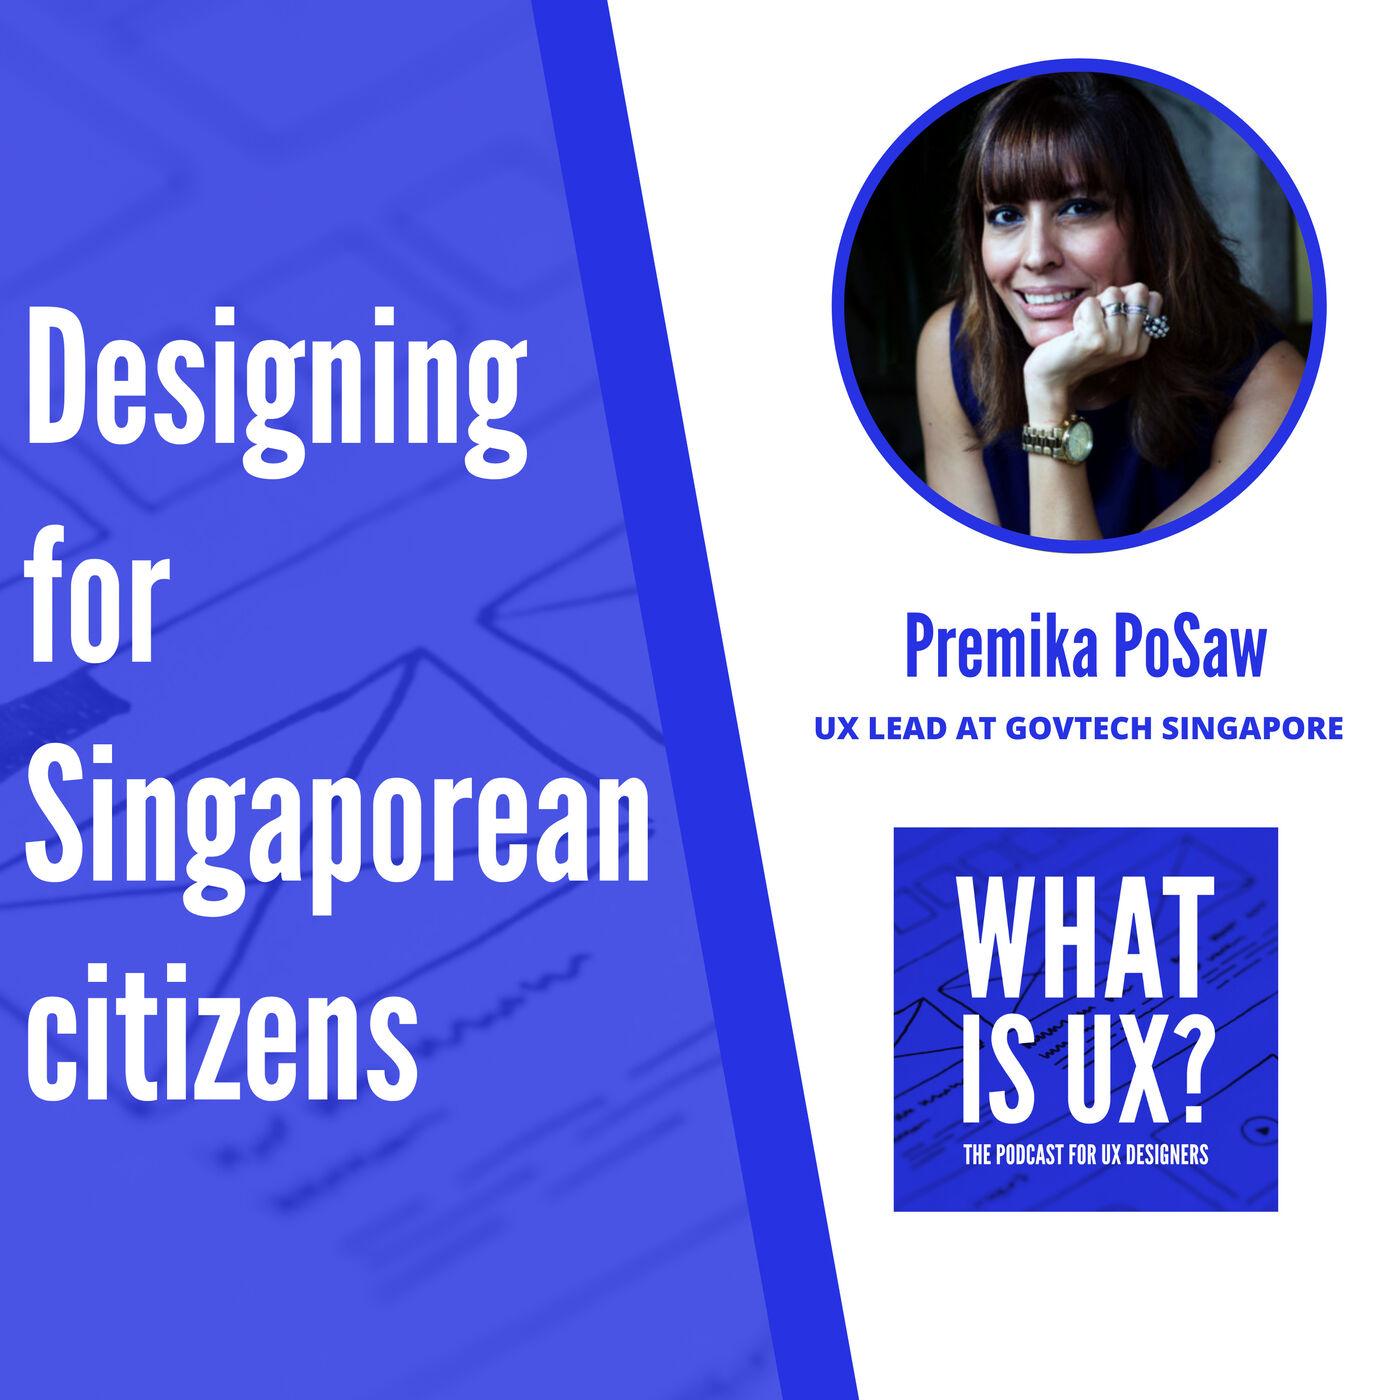 S2E2 Designing for Singaporean citizens. Interview with UX Lead Premika PoSaw, GovTech Singapore